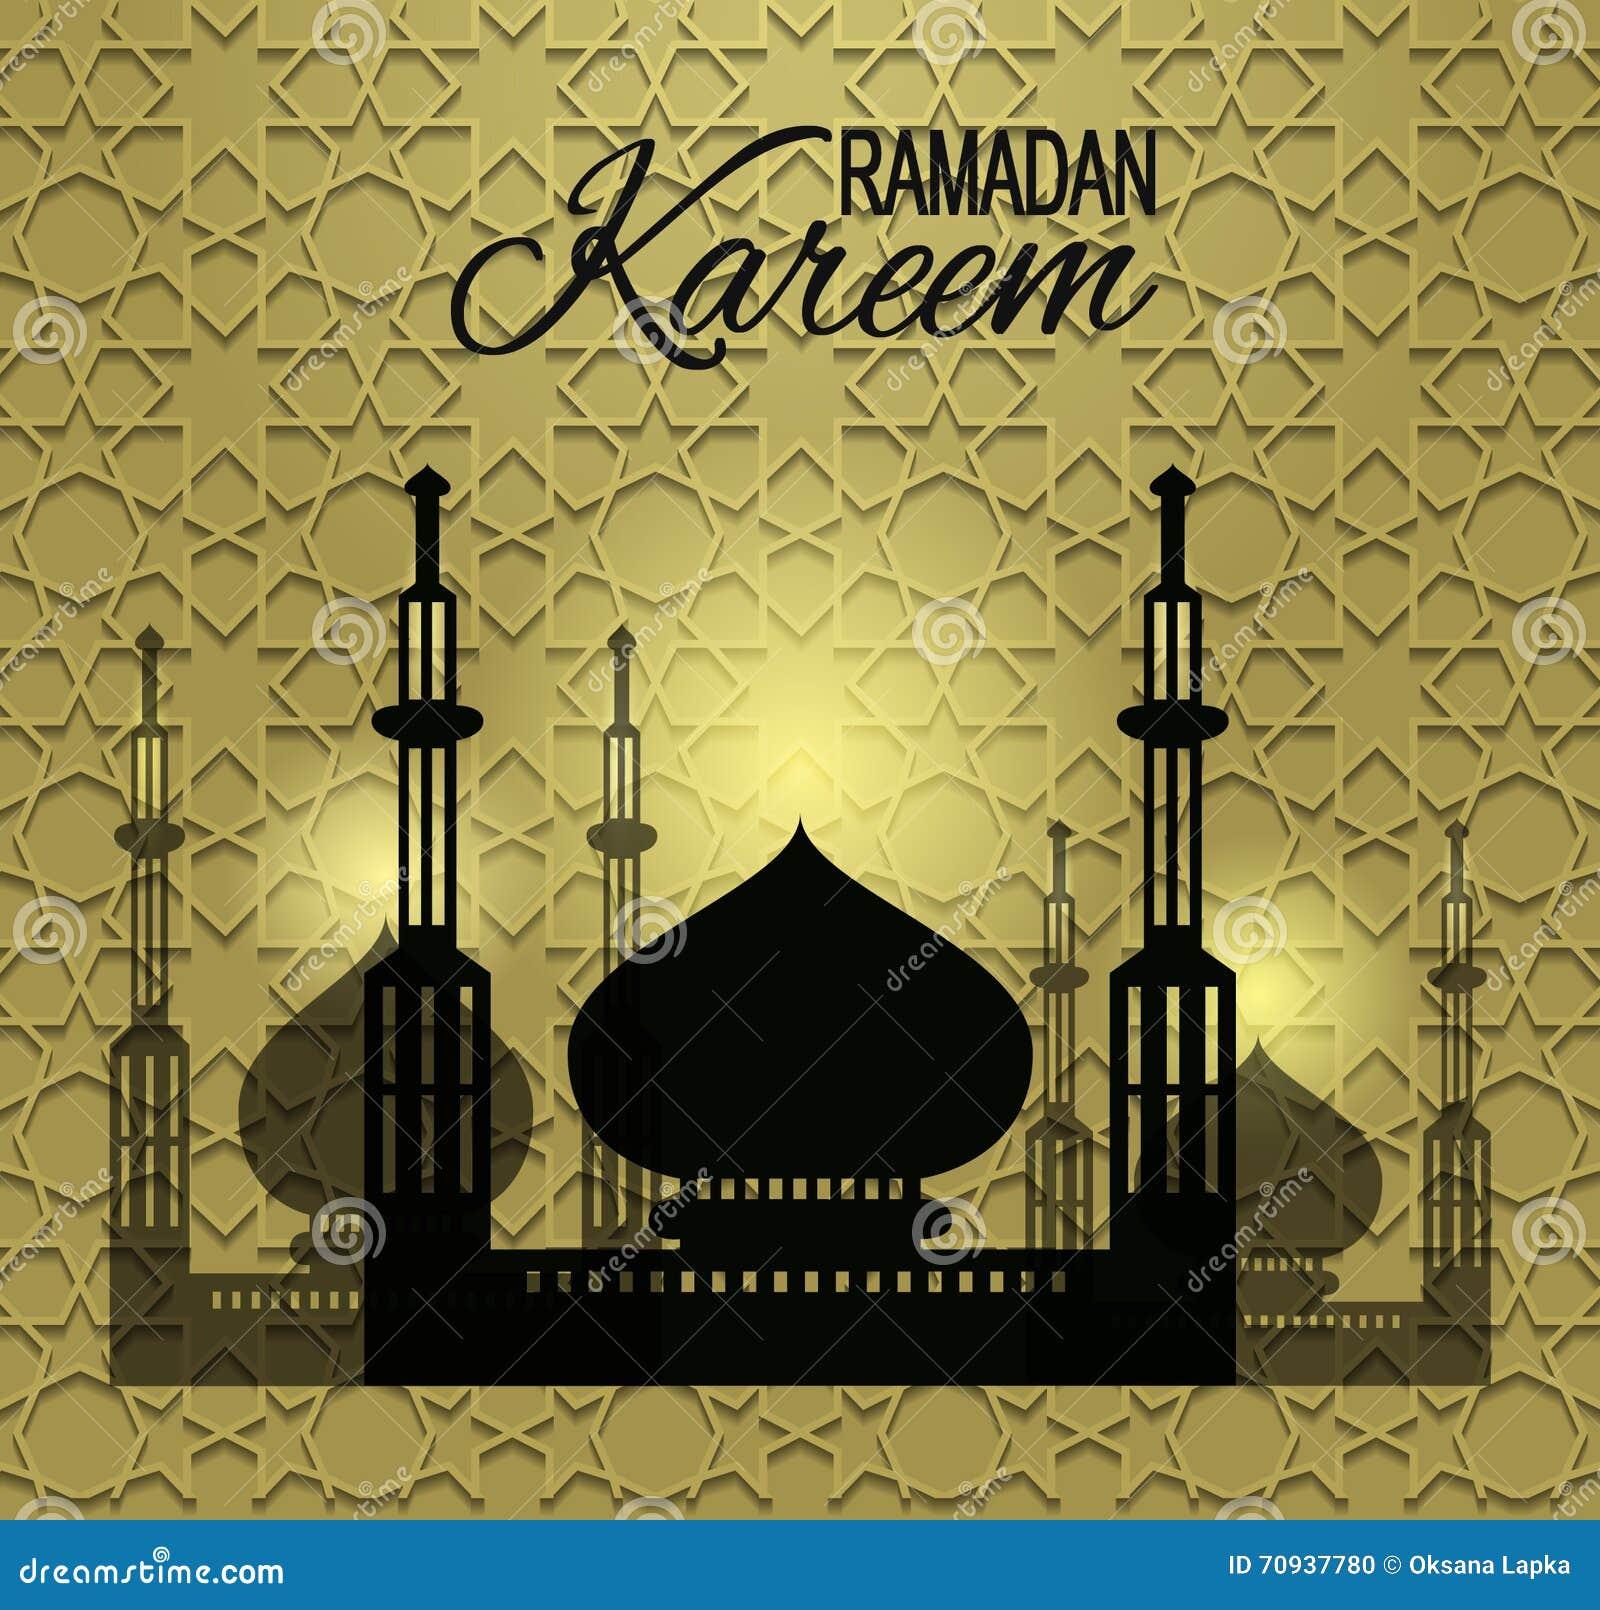 Mosque background for ramadan kareem stock photography image - Ramadan Kareem Shiny Background With Mosque Silhouette Greeting Card For Holy Month Ramadan Ramadan